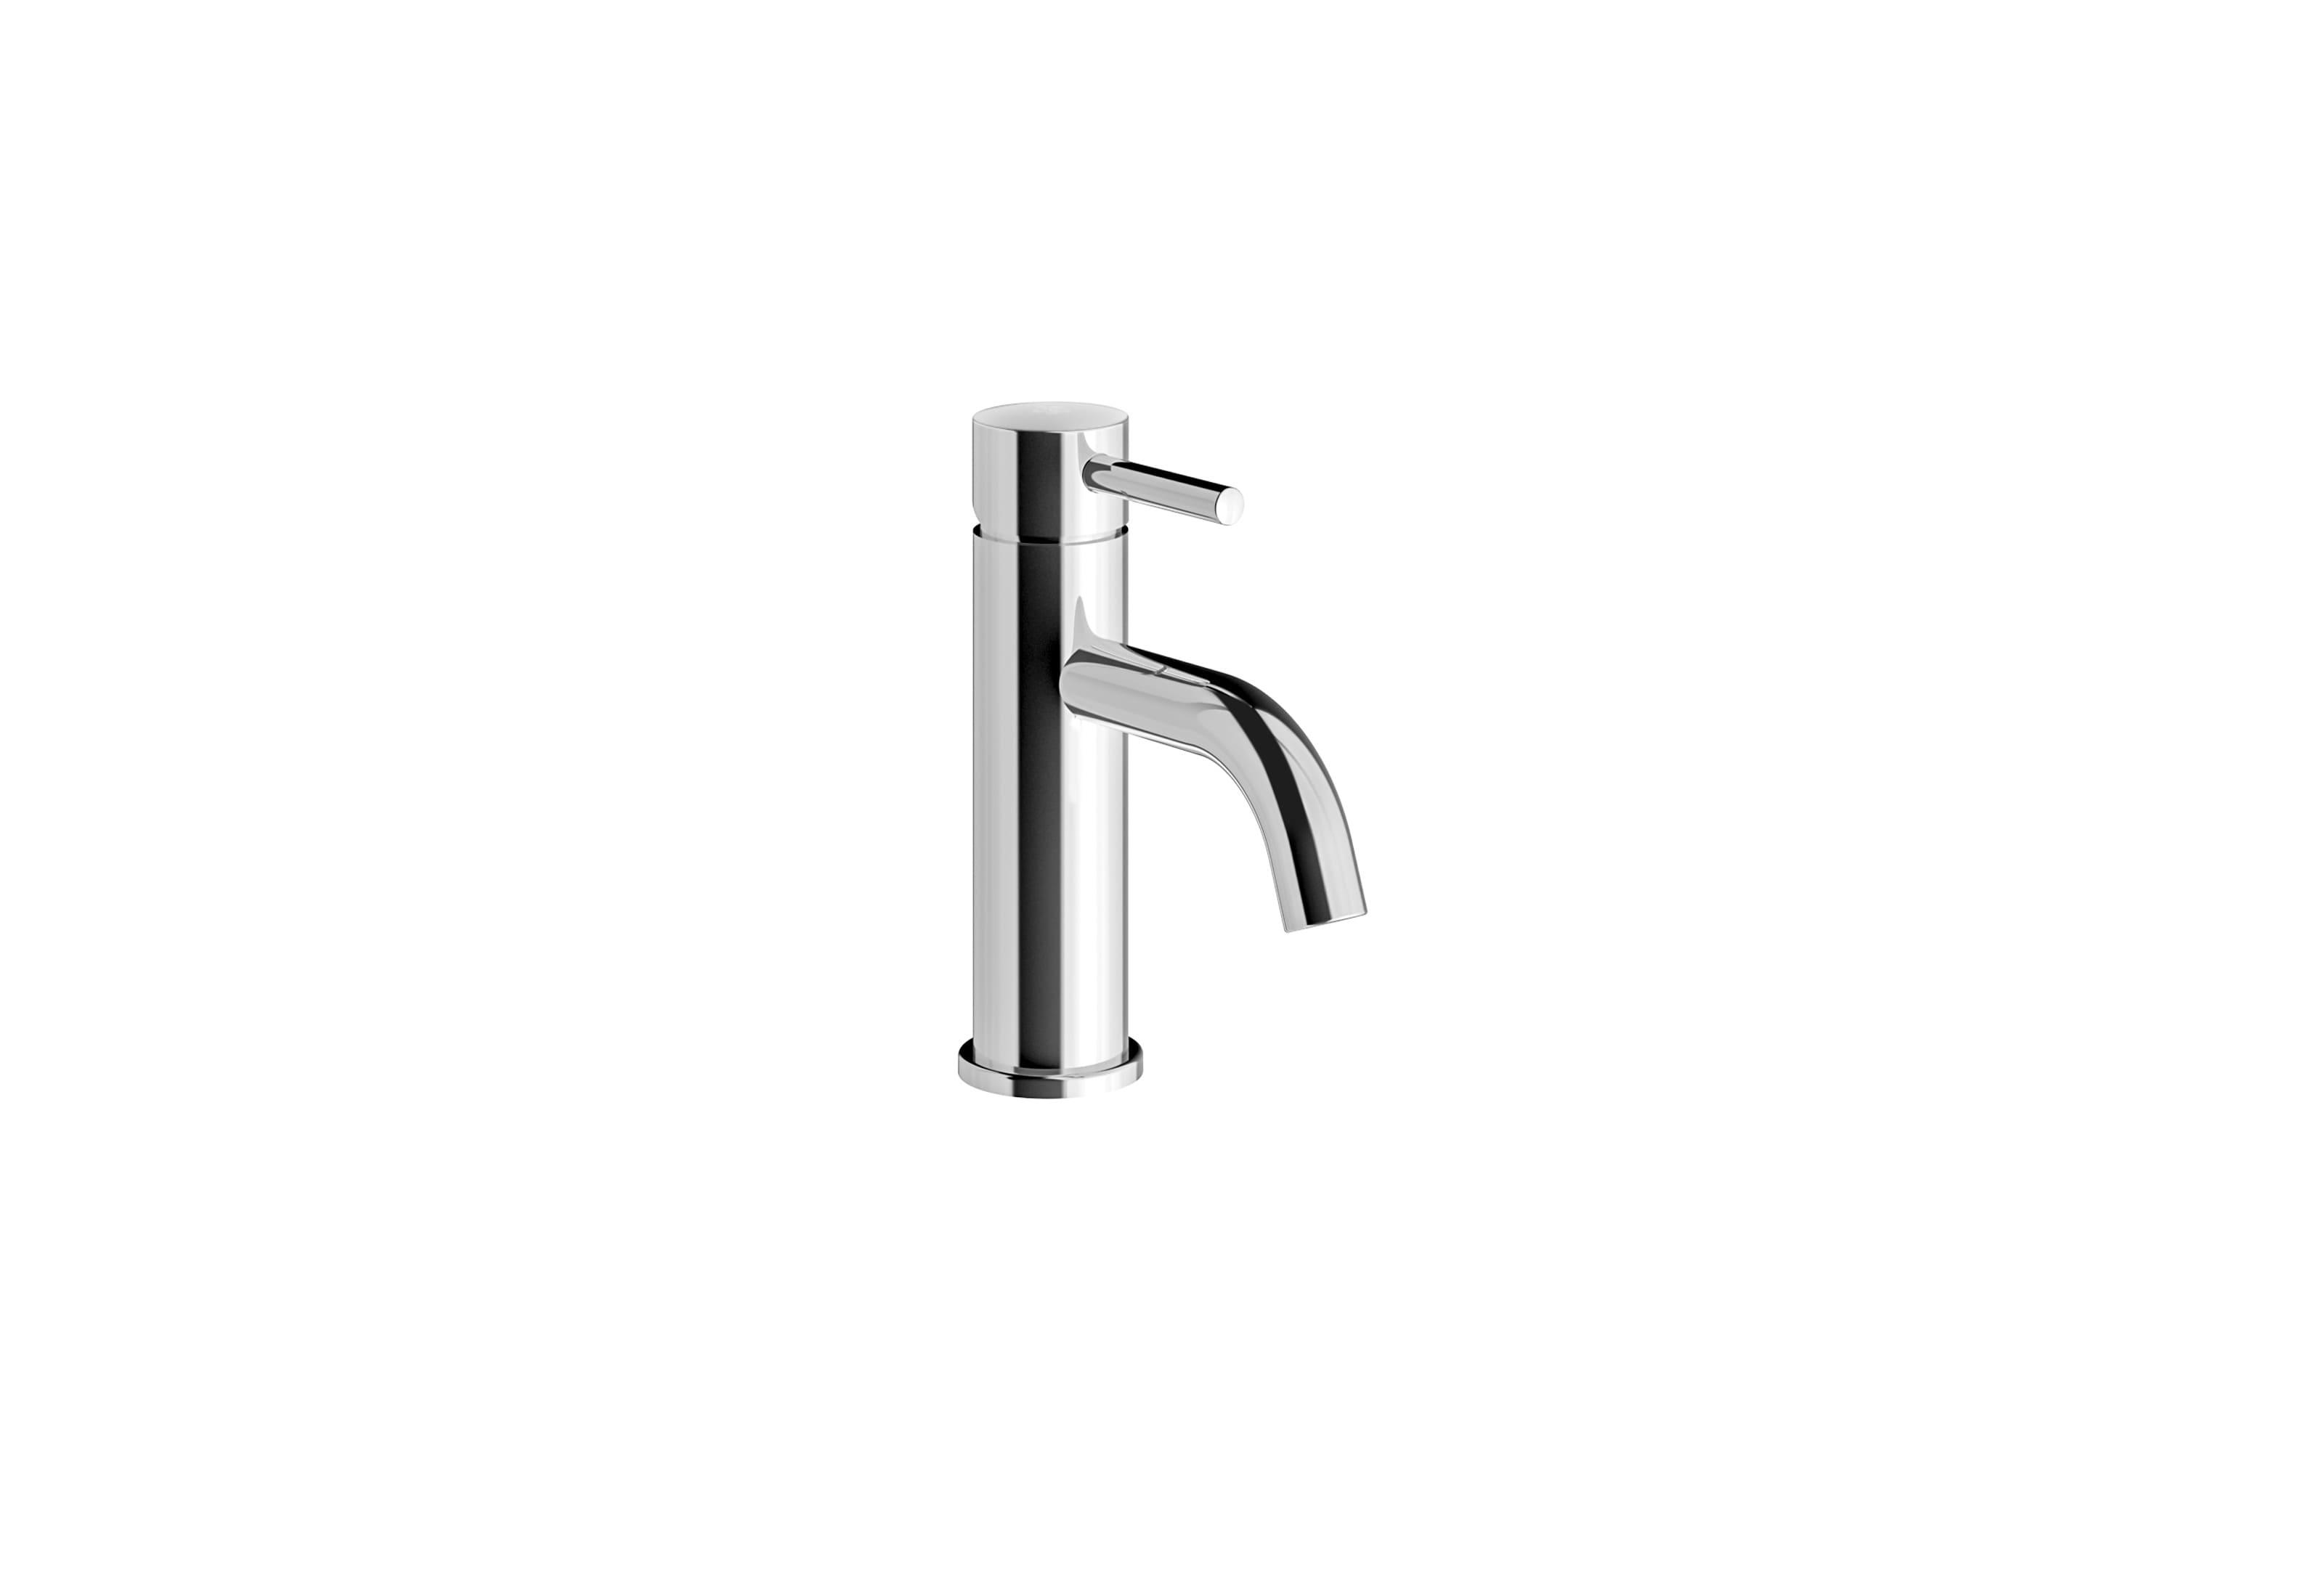 fancyU 15L 20L Recorrido autocontrolado del autom/óvil con el Grifo de Agua Mineral Barril de Agua Pura Cubo de pl/ástico Contenedor de Almacenamiento de Agua para el hogar con Tapa